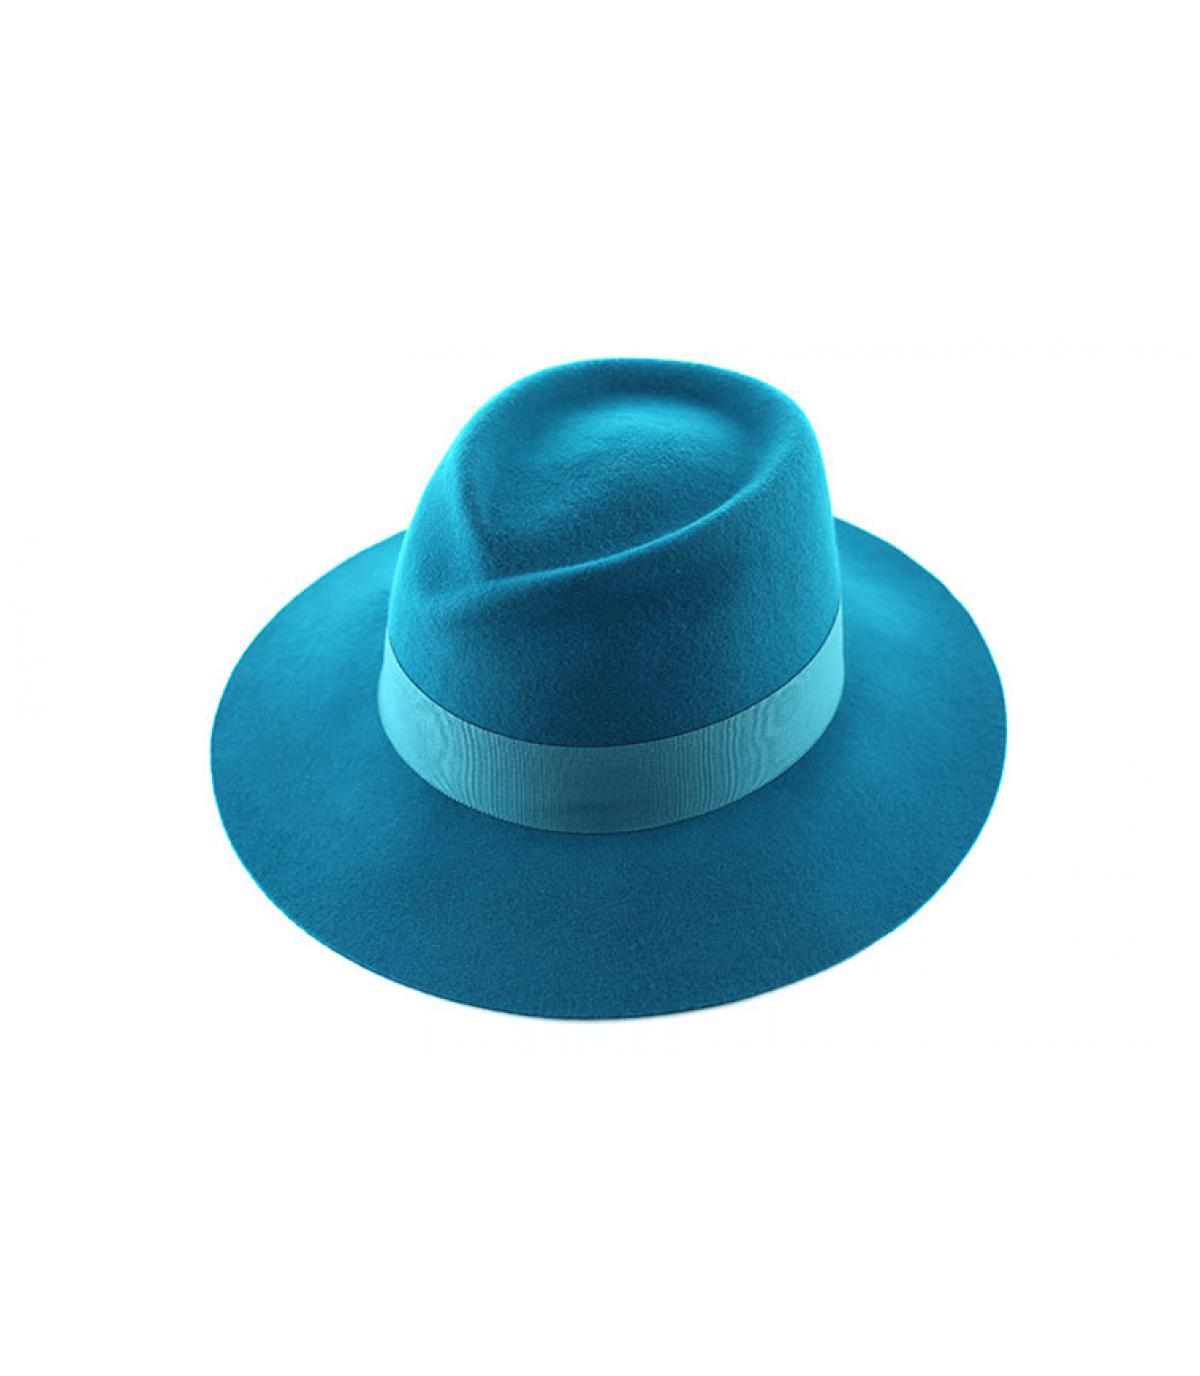 Sombrero mujer fedora azul - Fedora petrol Seeberger imagen 1 ... a5d0e4ed8b33